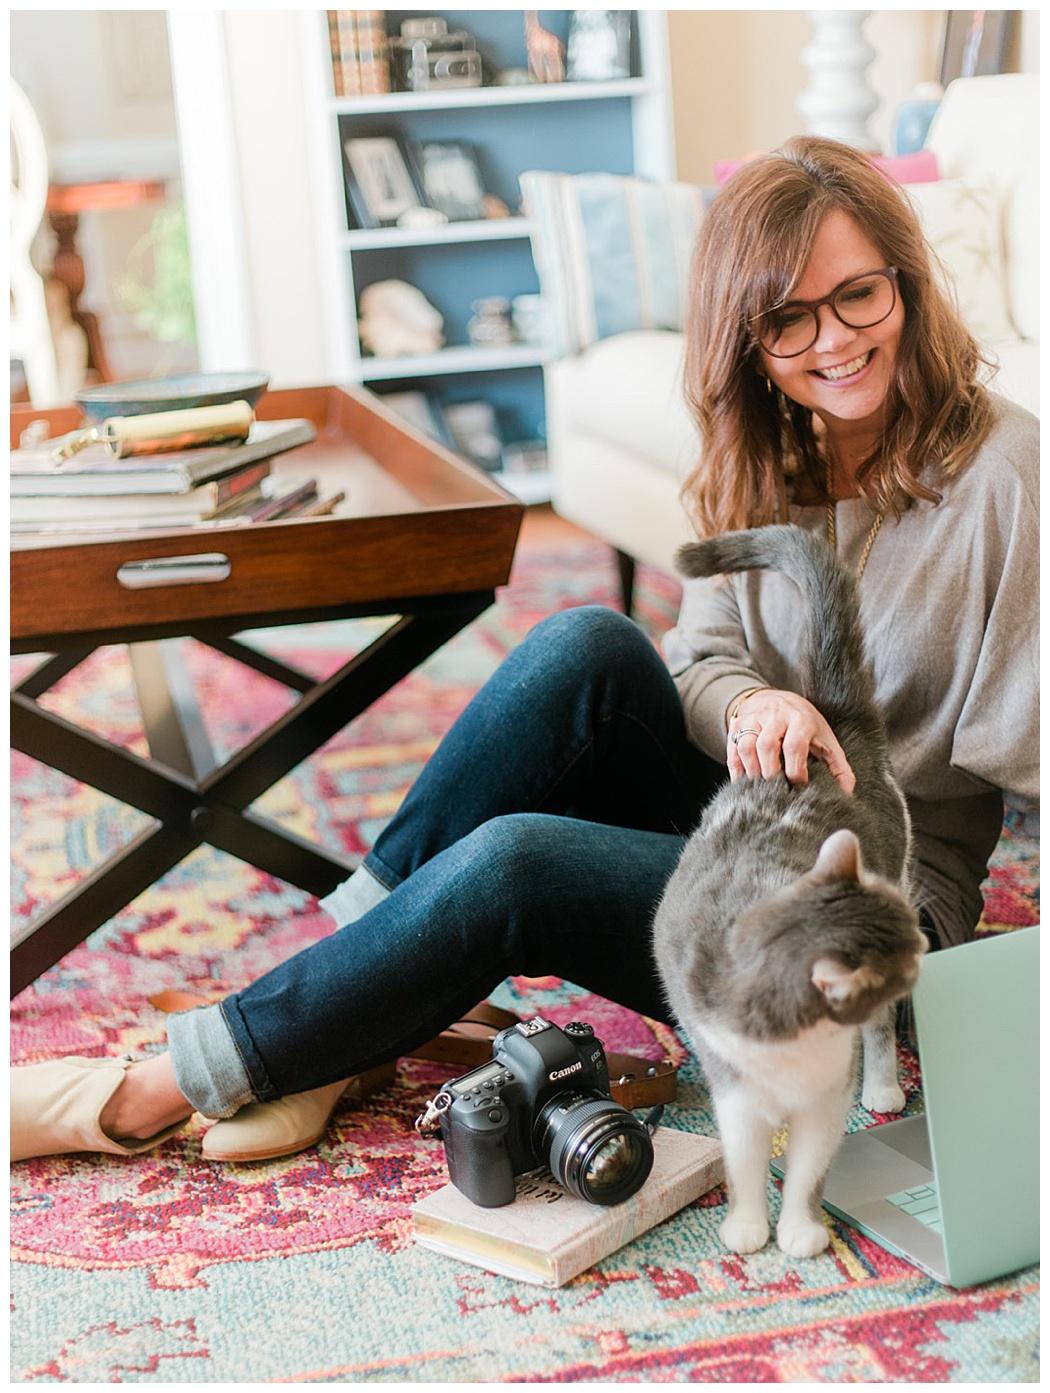 cat essential oils - Cat became sick